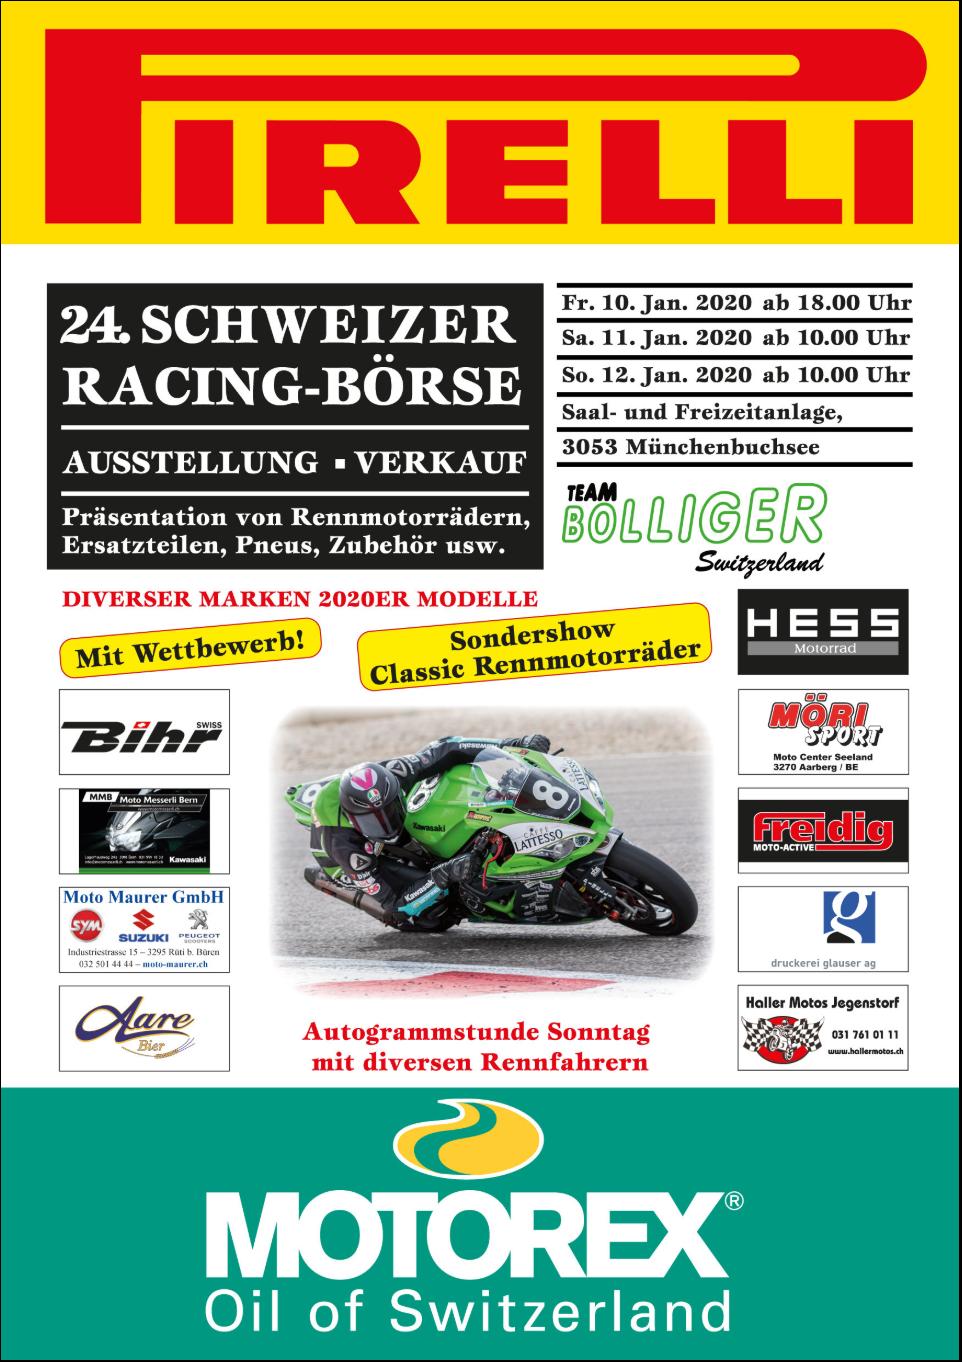 Racing-Börse.png